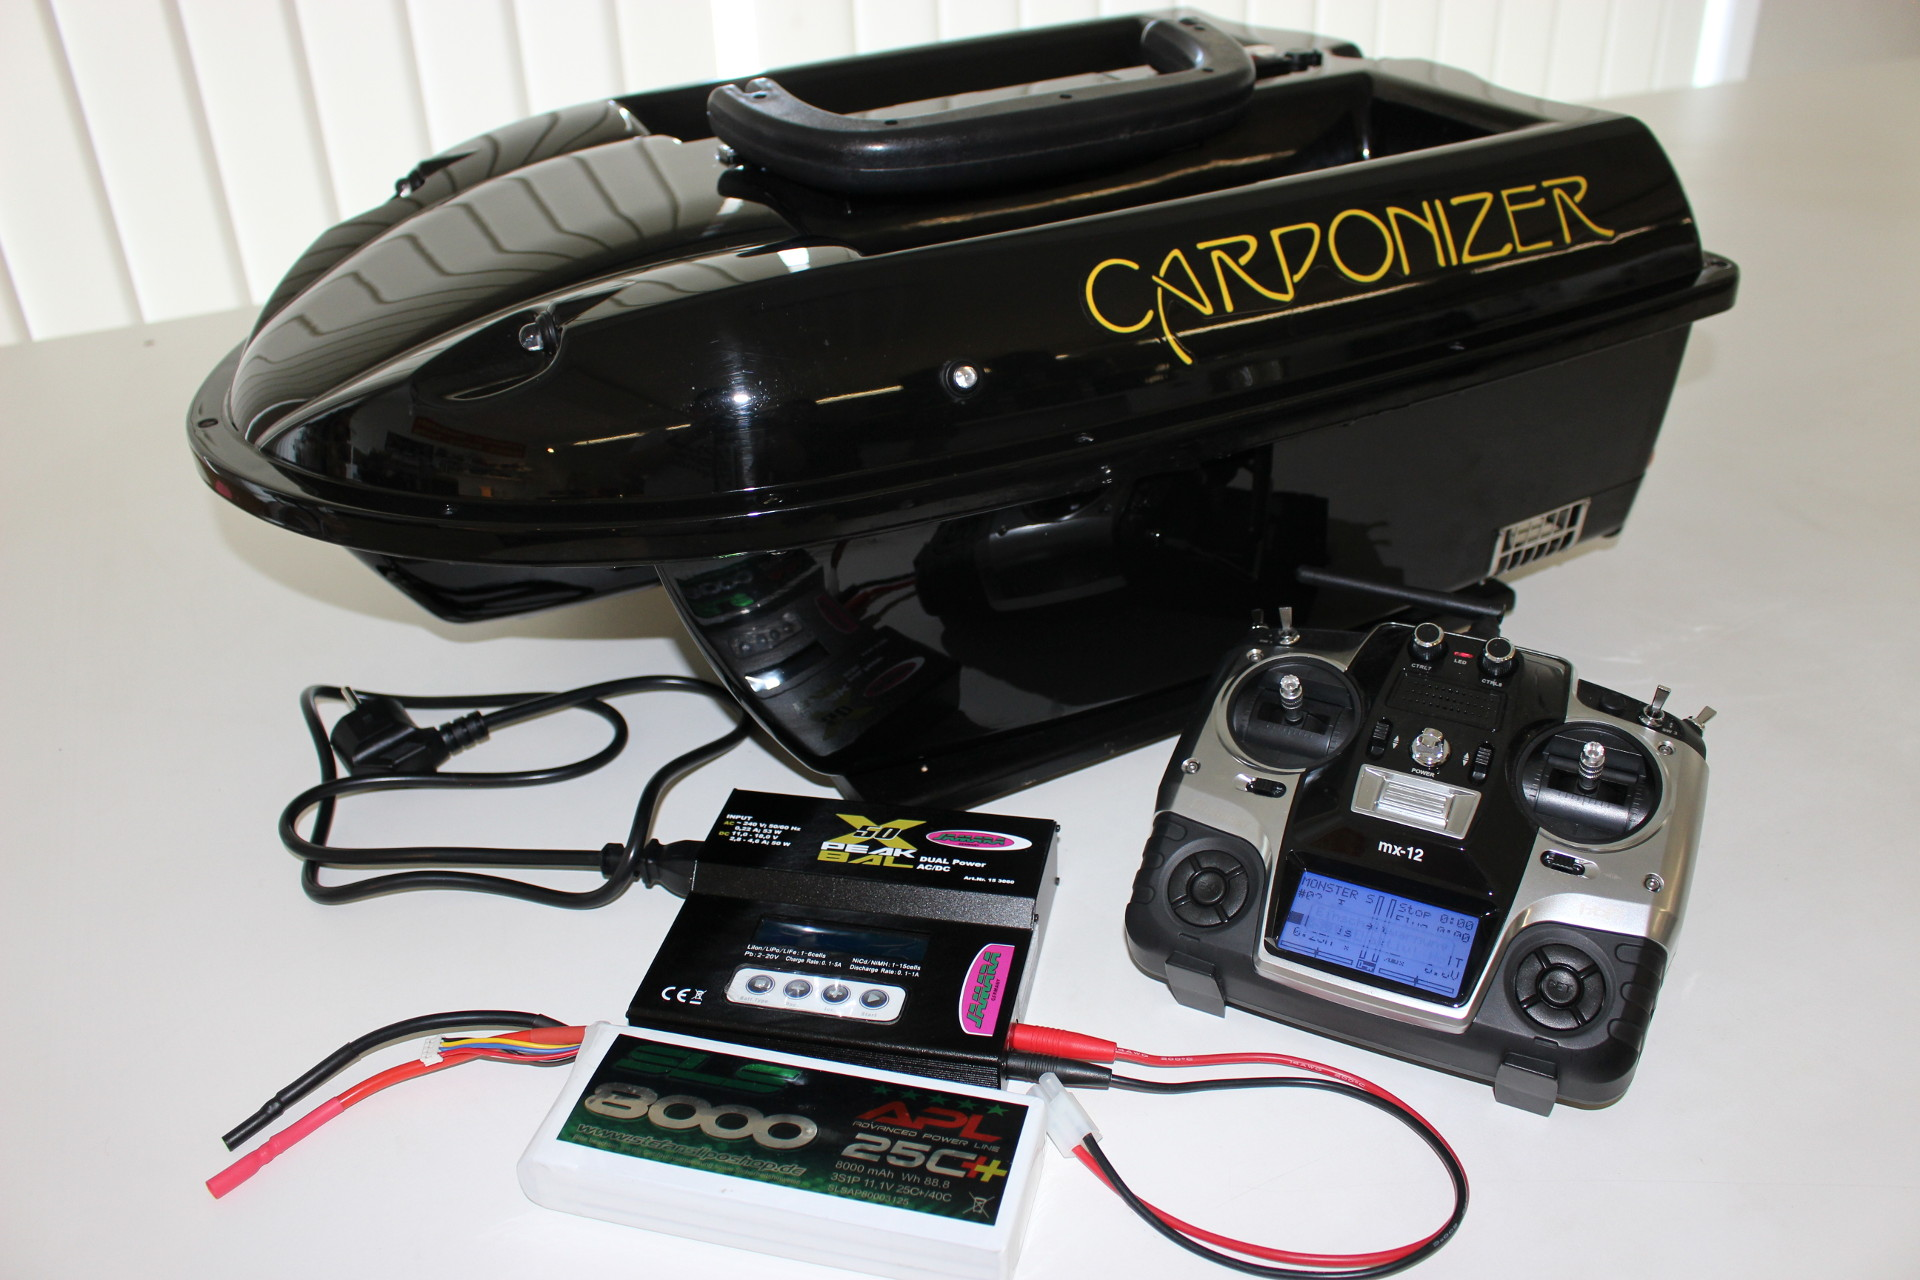 CarponizerLipo